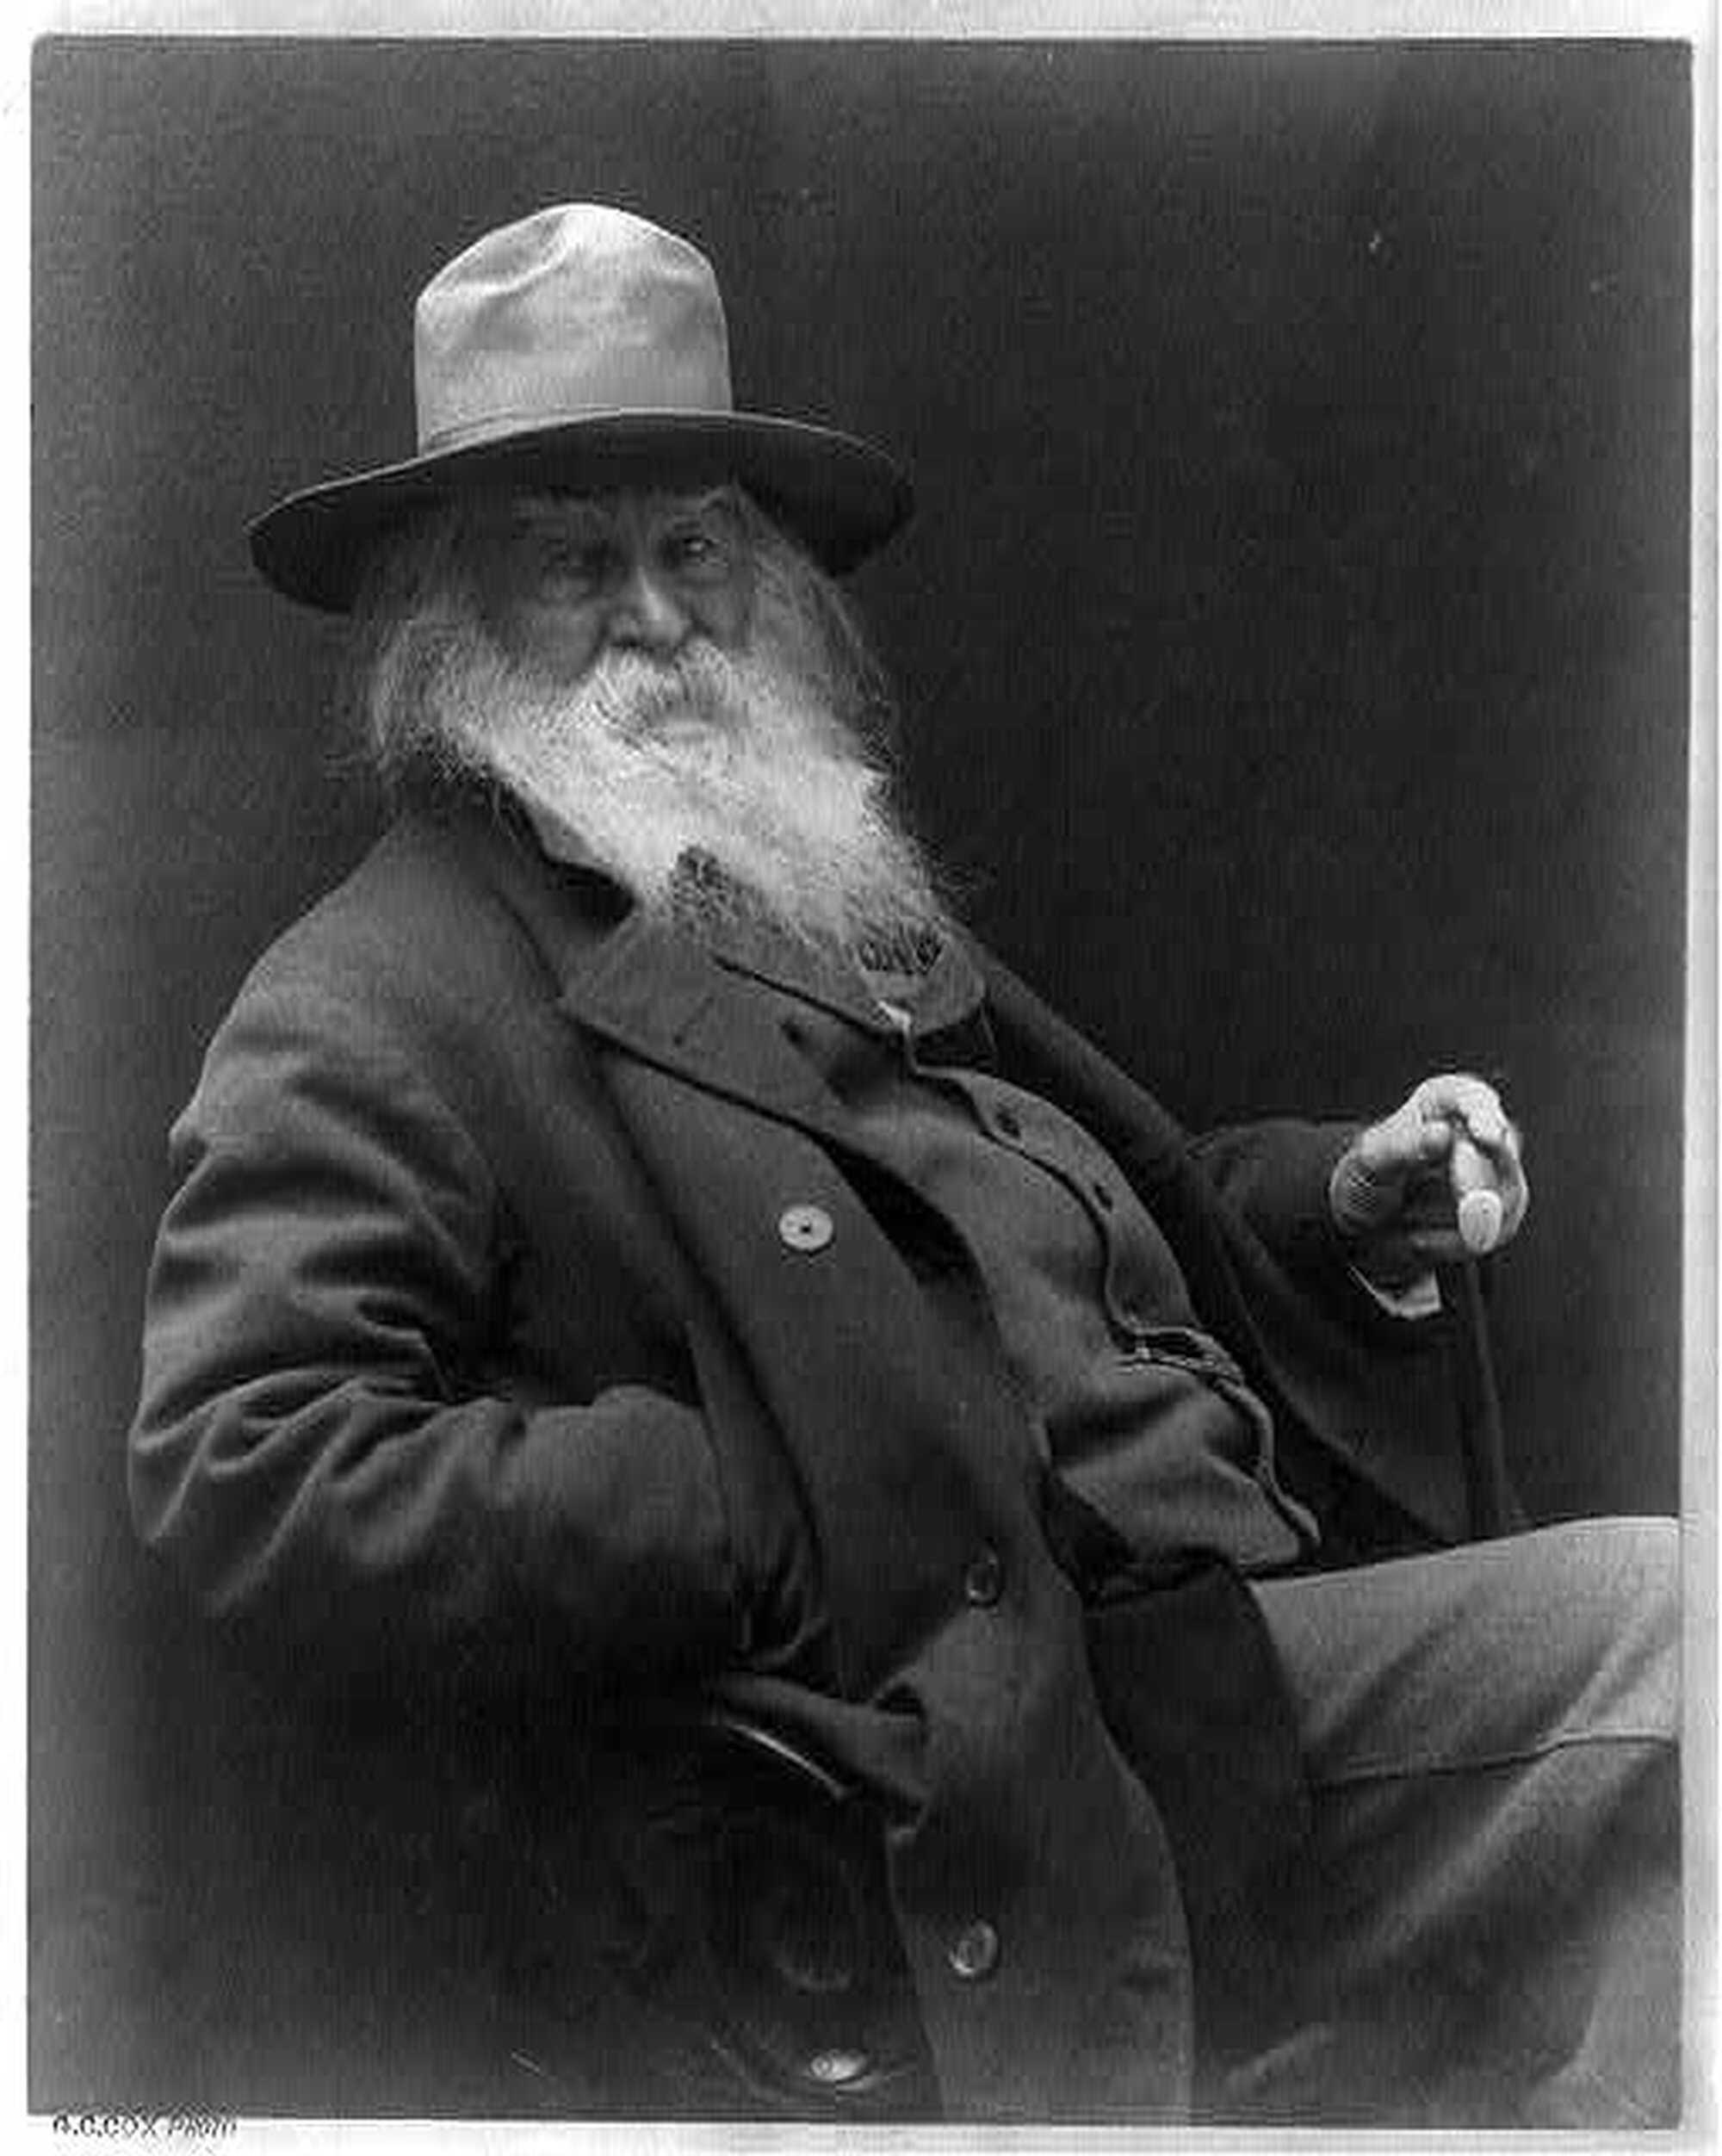 Whitman 5 Aug 1887 LOC.jpg